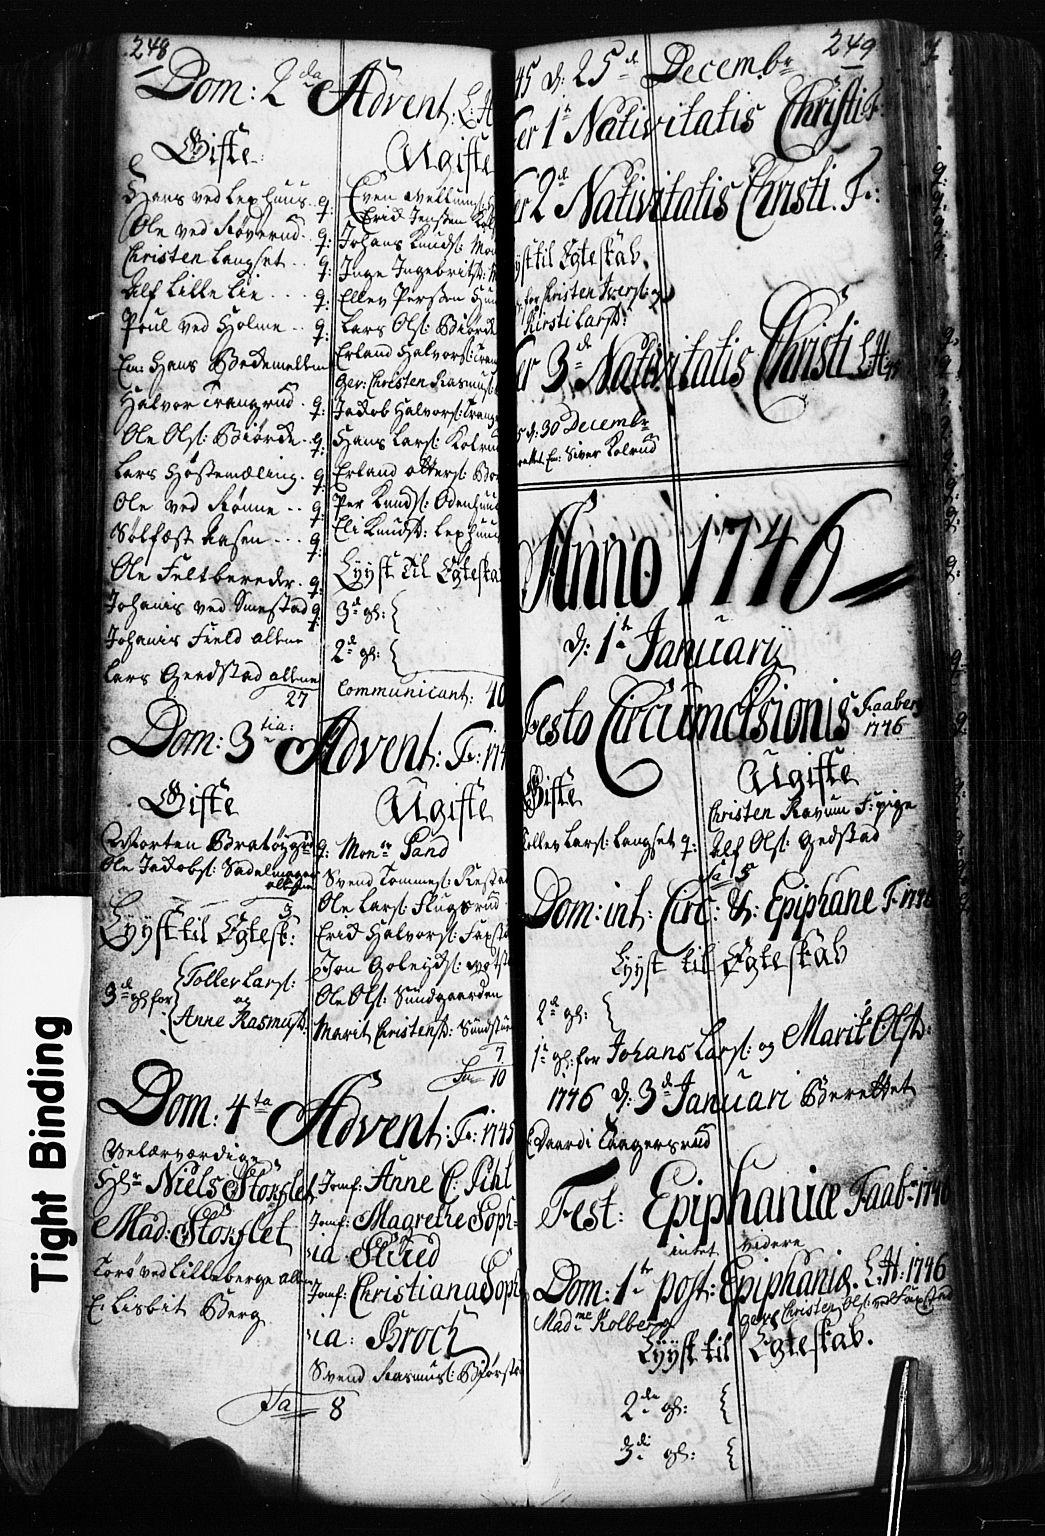 SAH, Fåberg prestekontor, Klokkerbok nr. 2, 1741-1756, s. 248-249